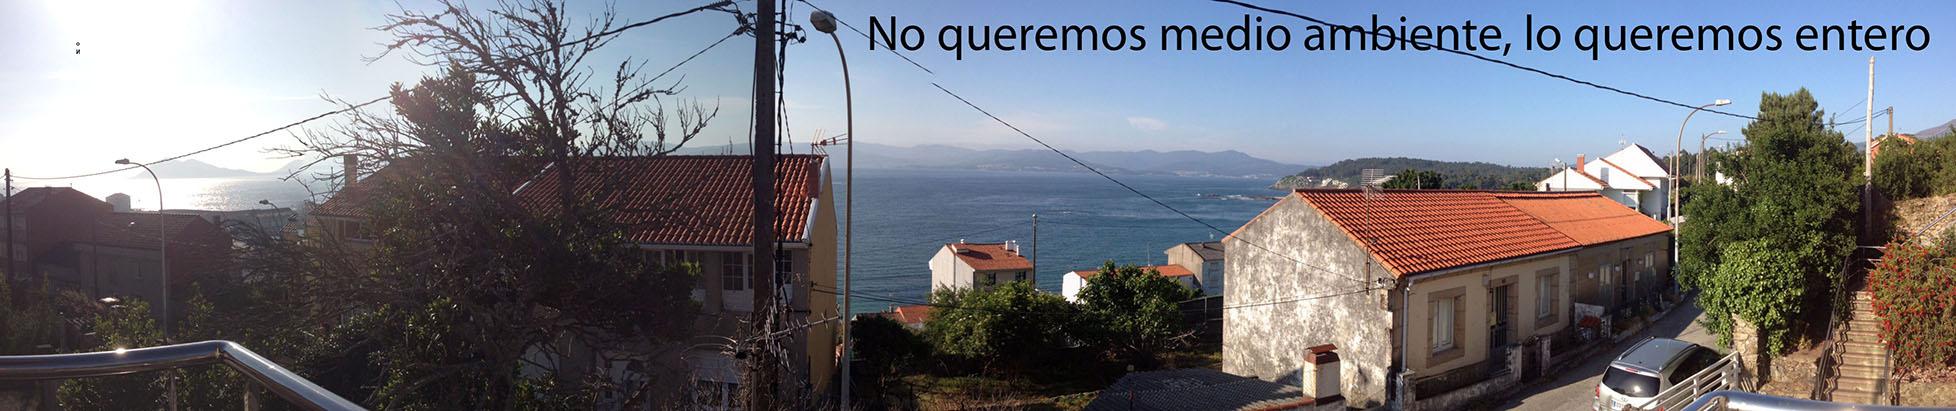 Alba González 3º ESO B IES Virxe do Mar